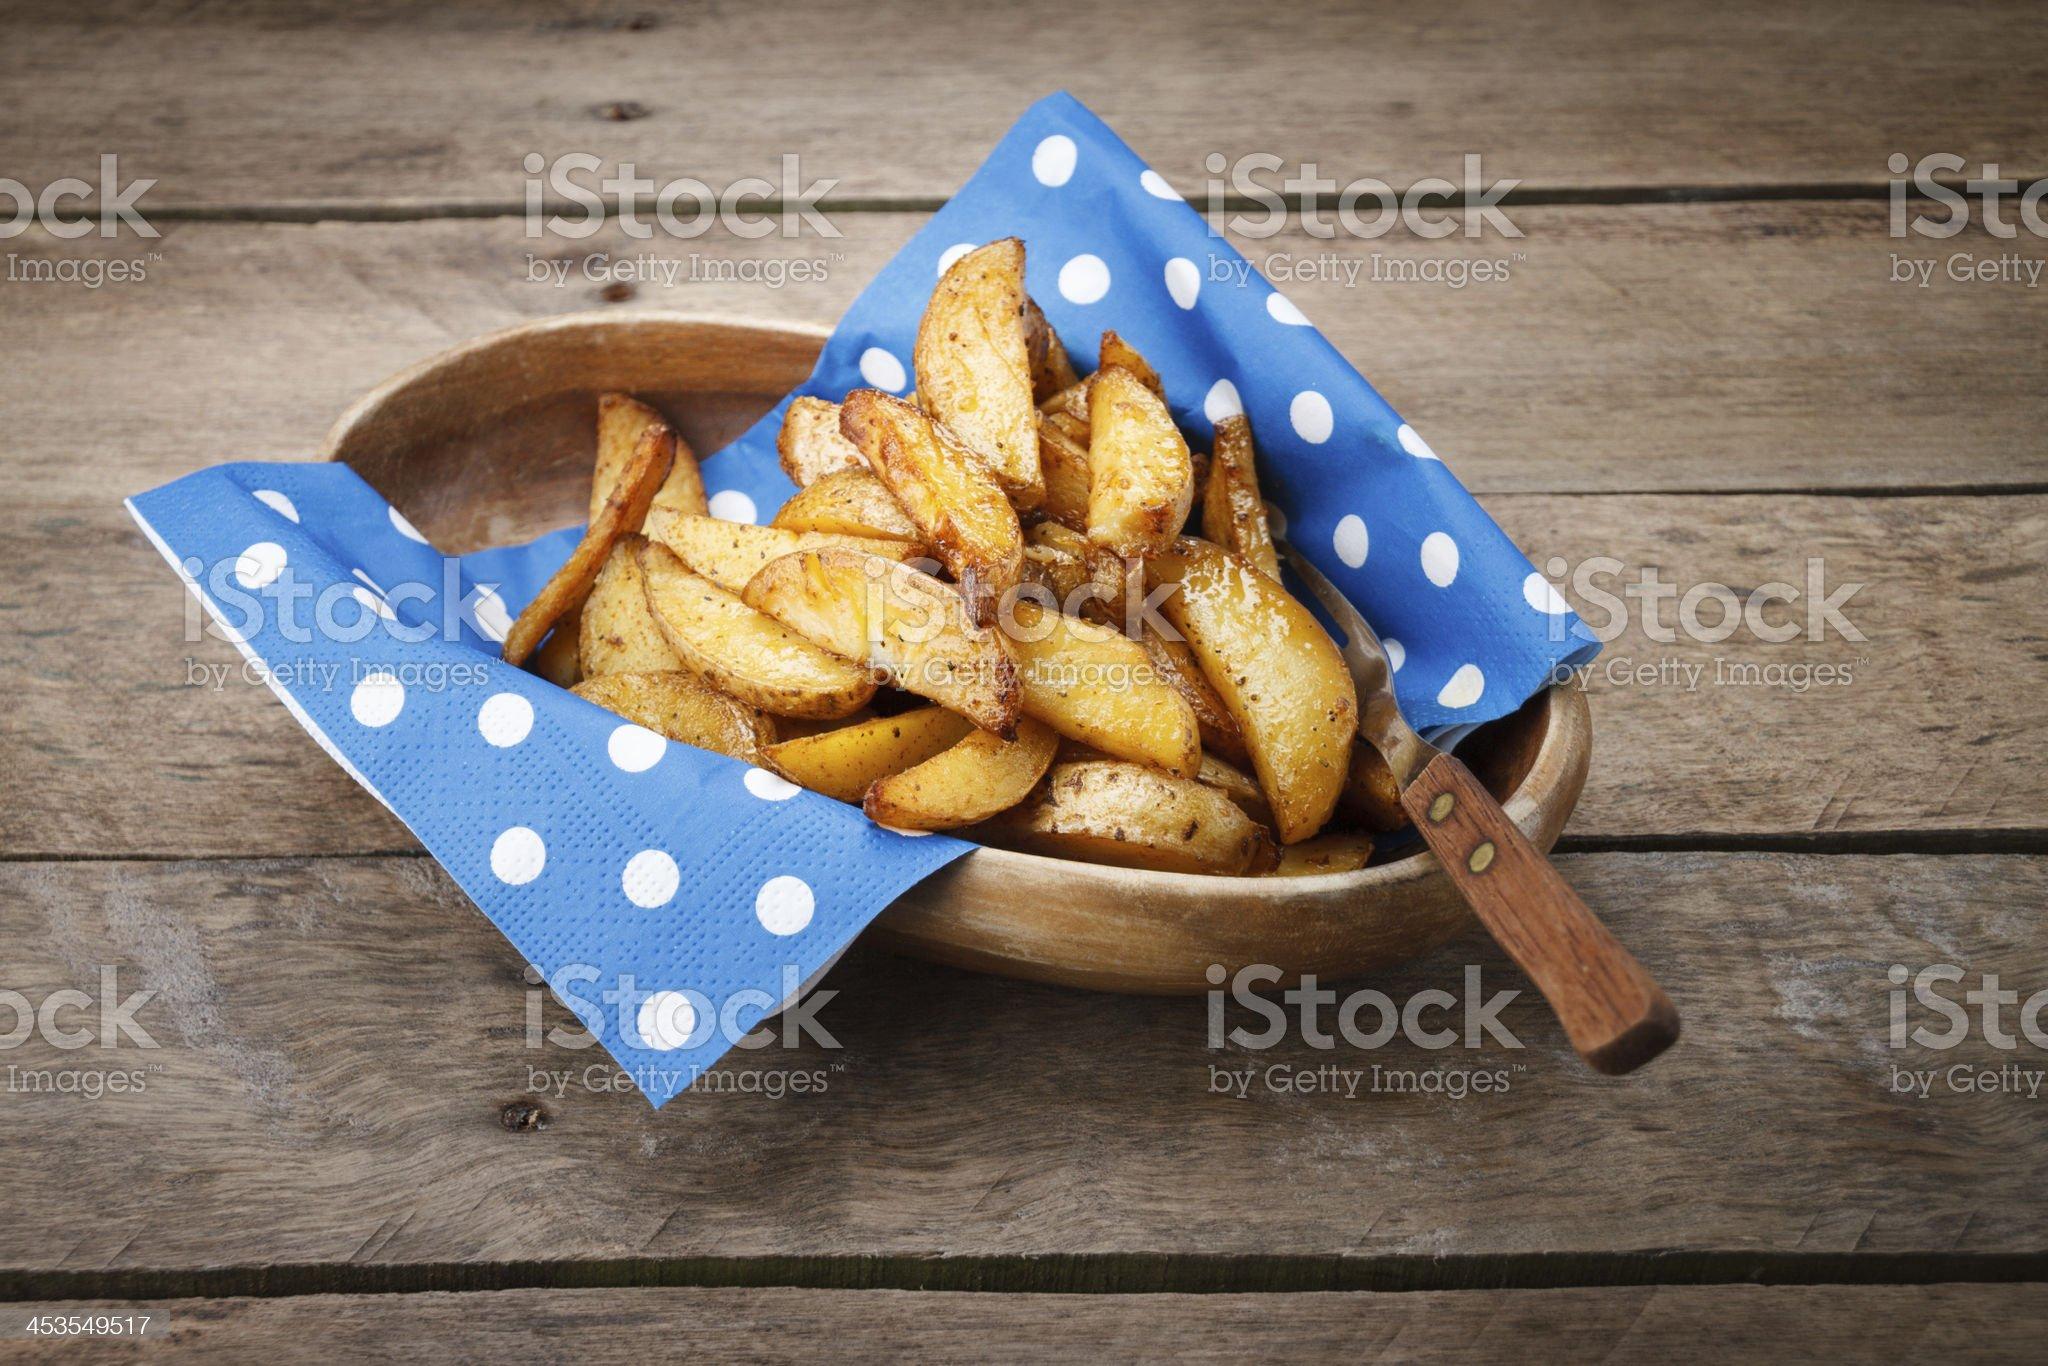 Fried potatoes. royalty-free stock photo